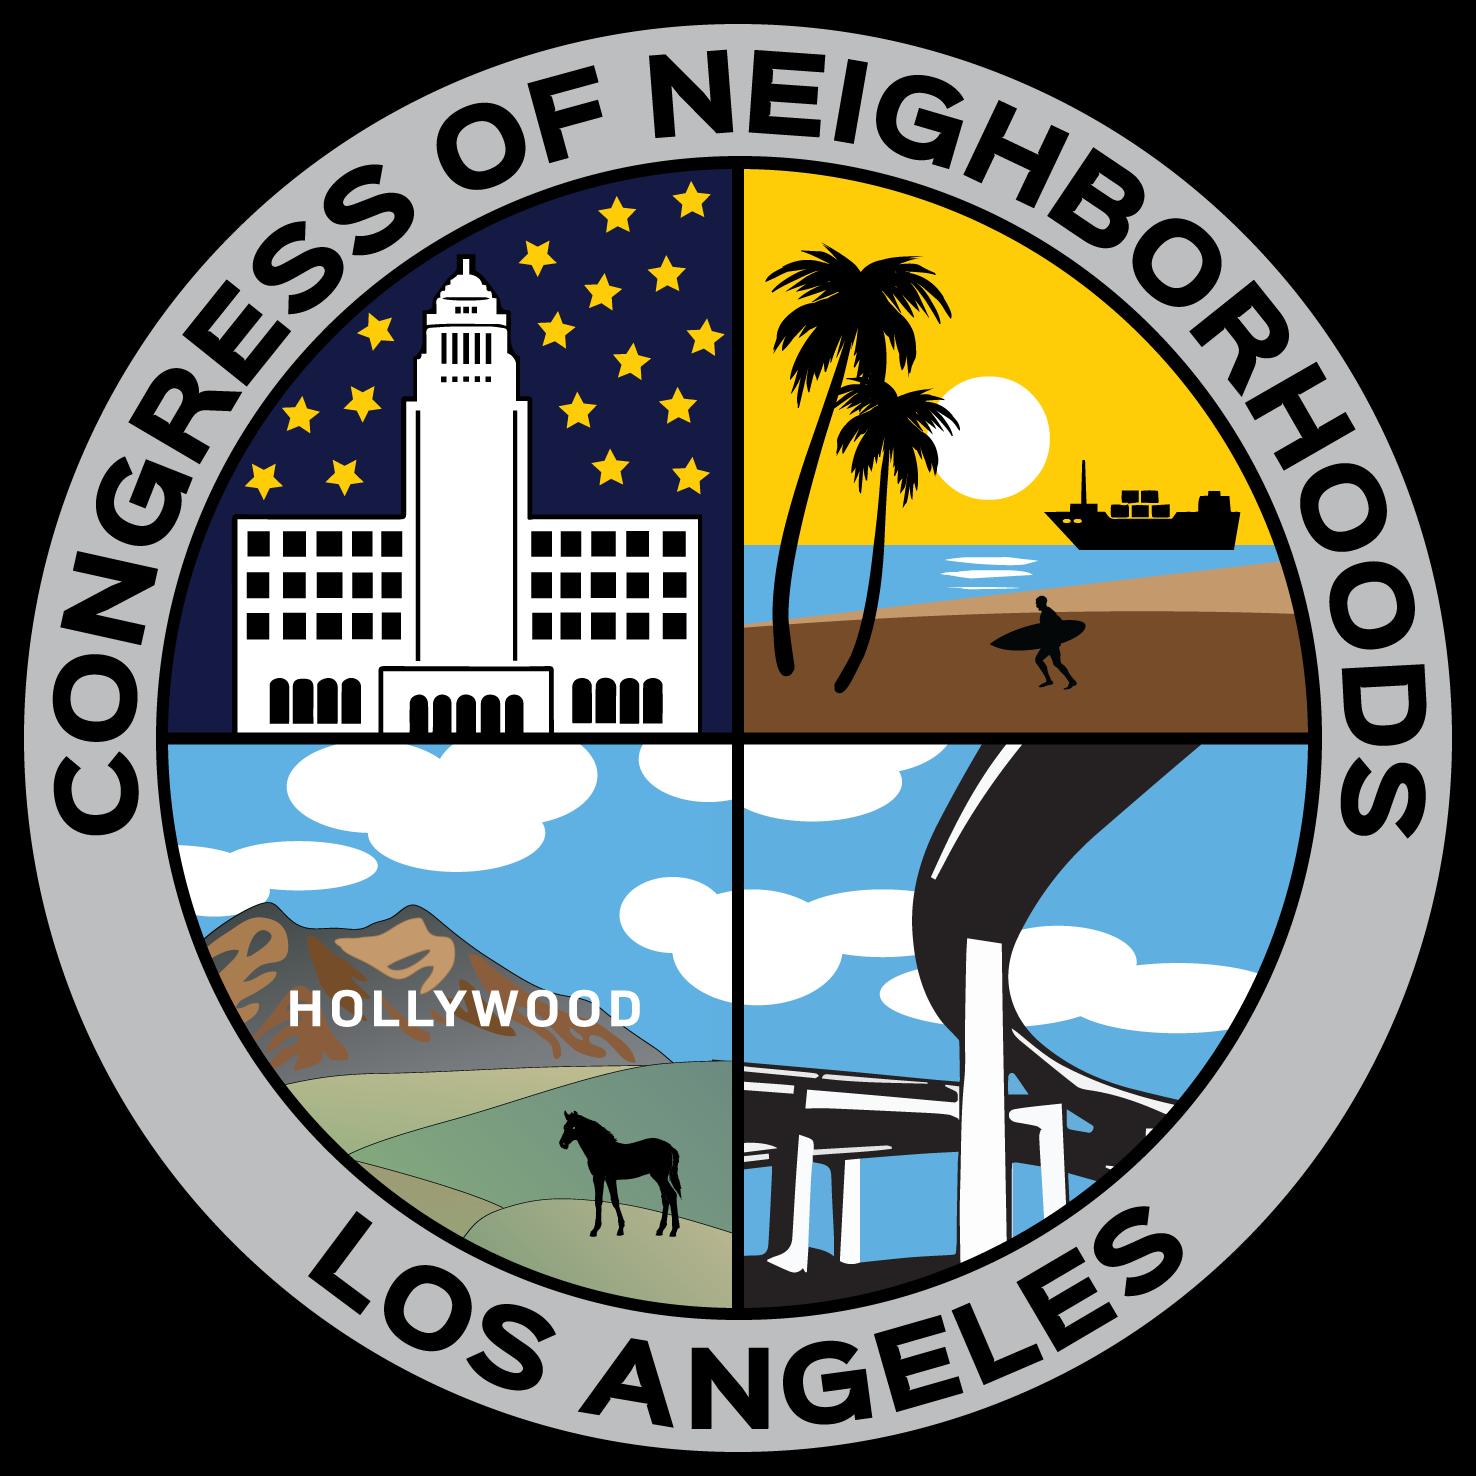 Neighborhood clipart neighborhood city. Los angeles congress of